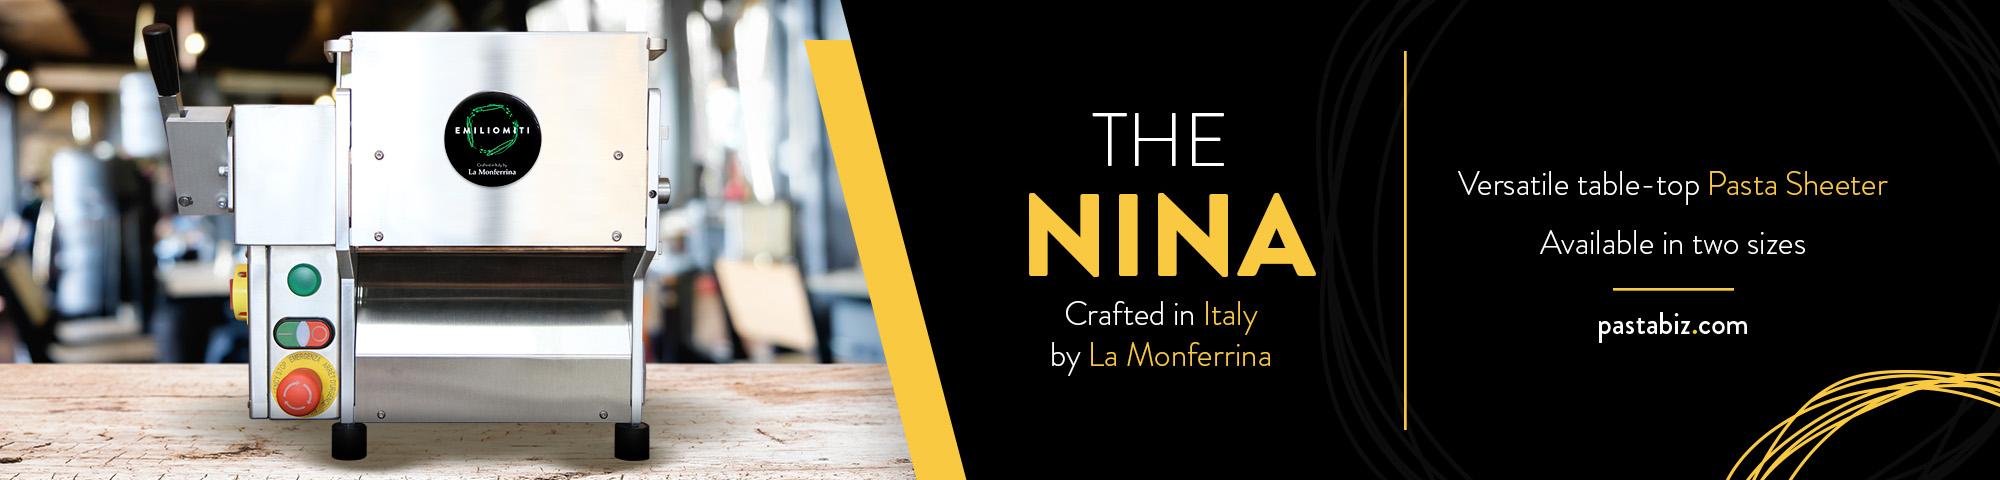 Nina Pasta Sheeter